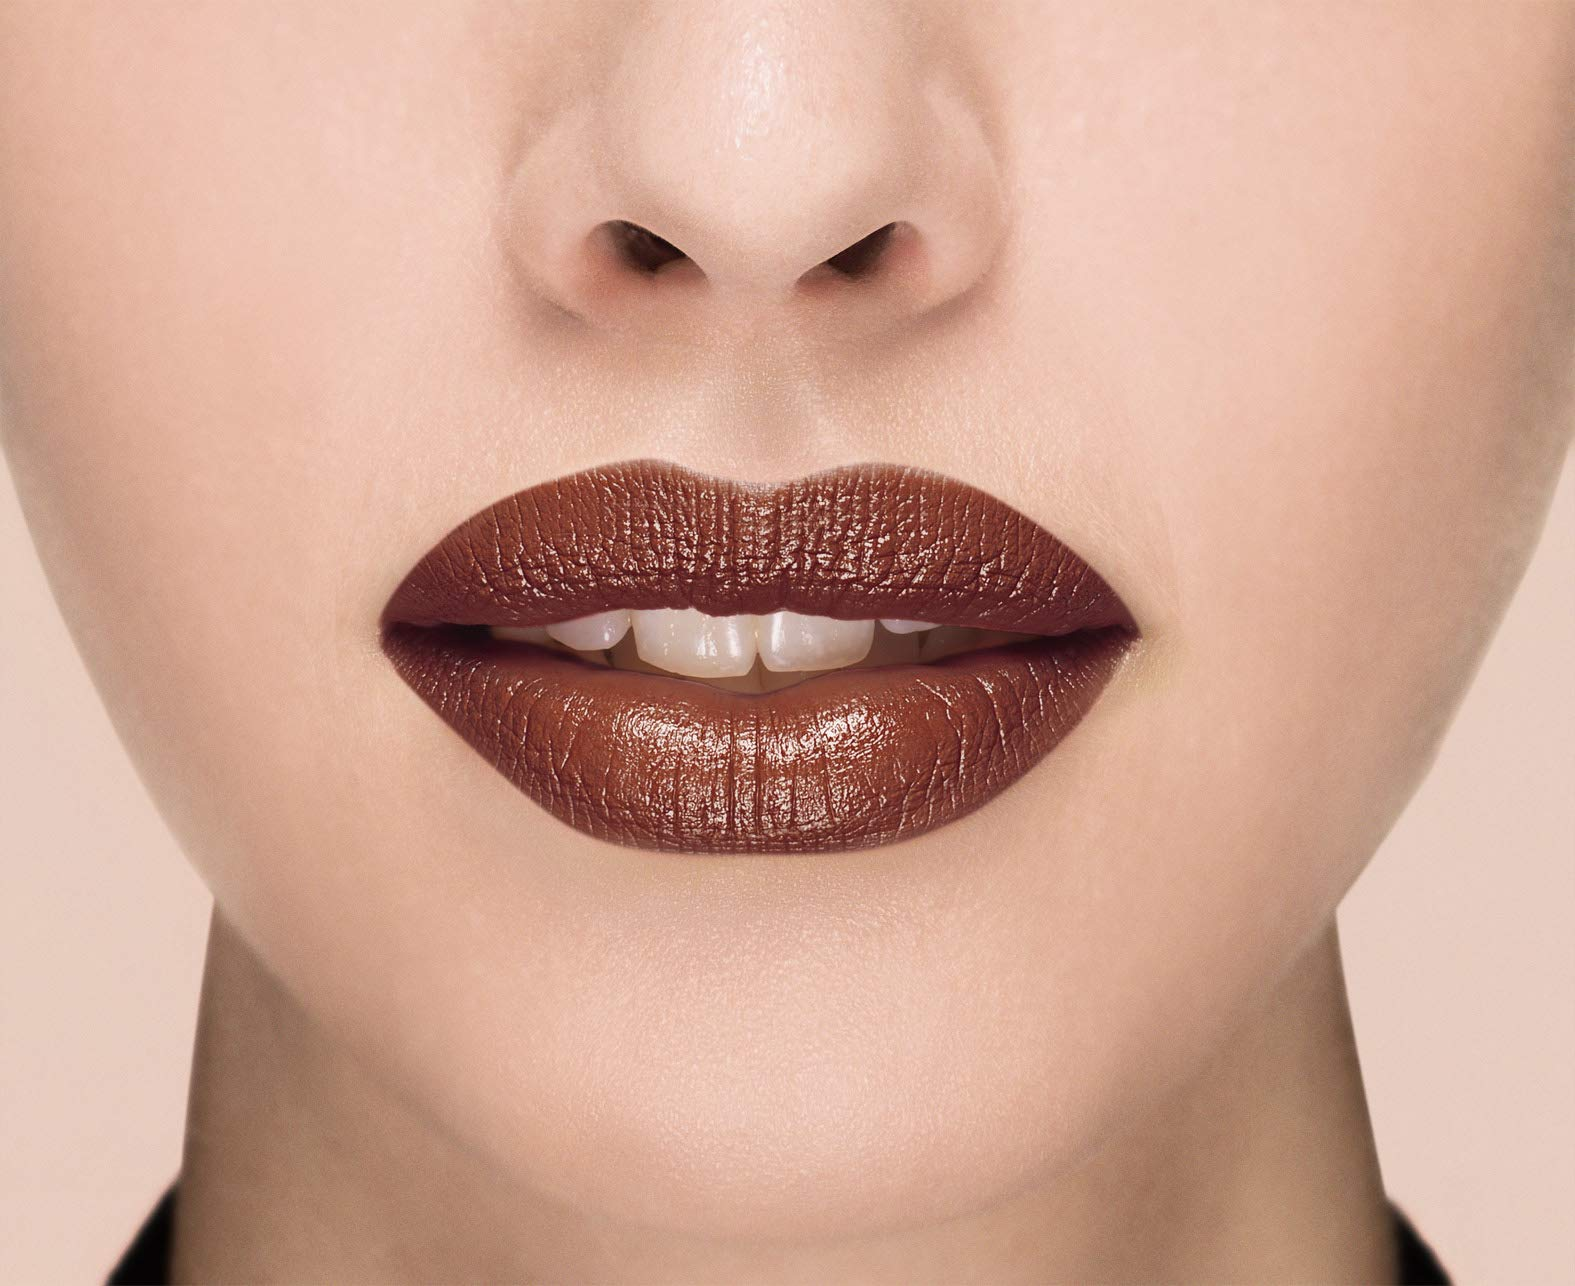 L'Oreal Paris Isabel Marant, Gloss de Labios y Mejillas, Tono Amaze